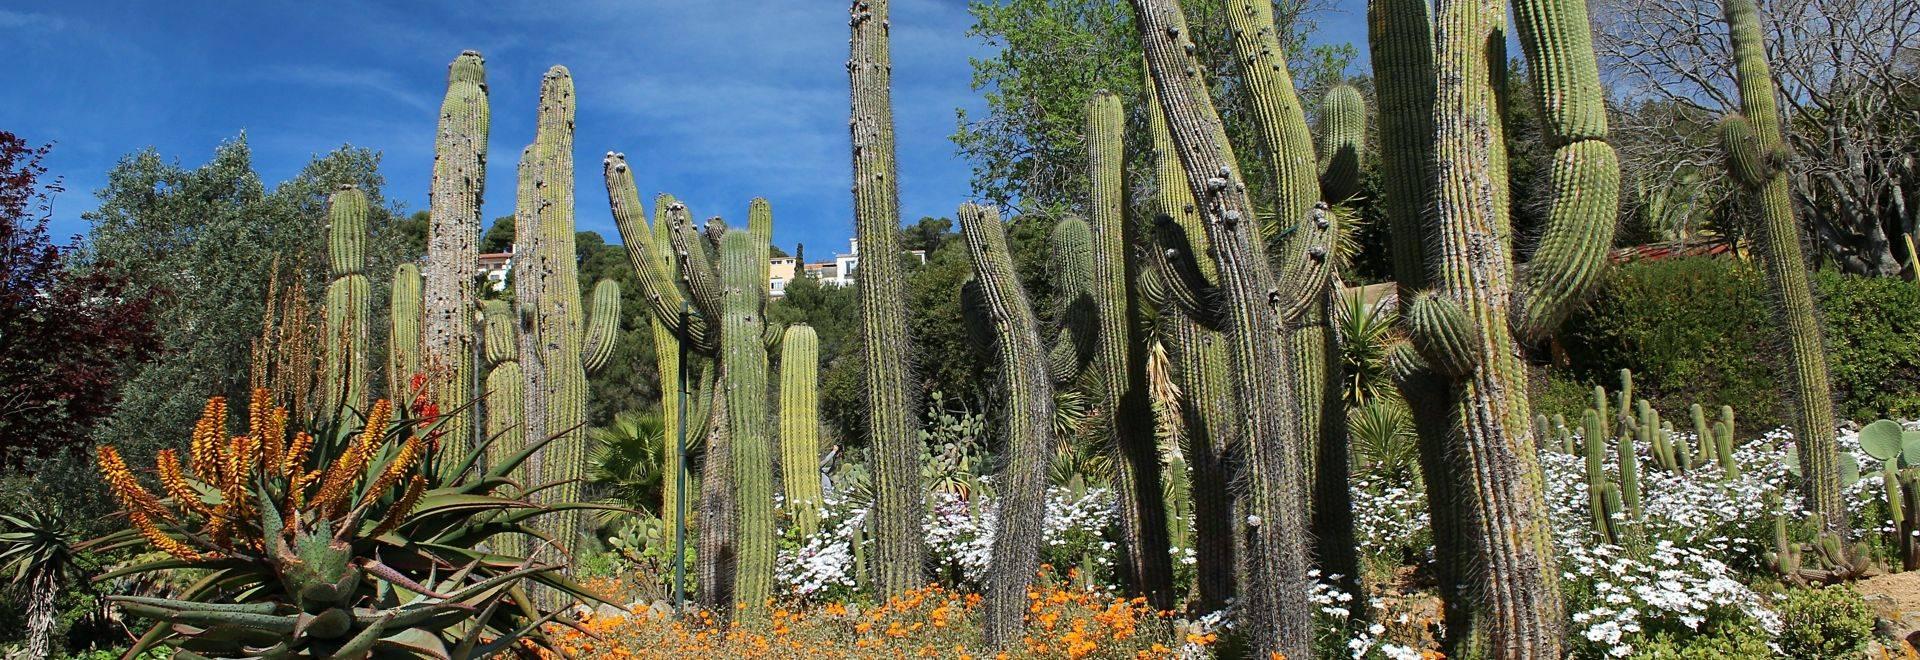 Botanical garden Pinya de Rosa in Costa Brava. Blanes. Catalonia.